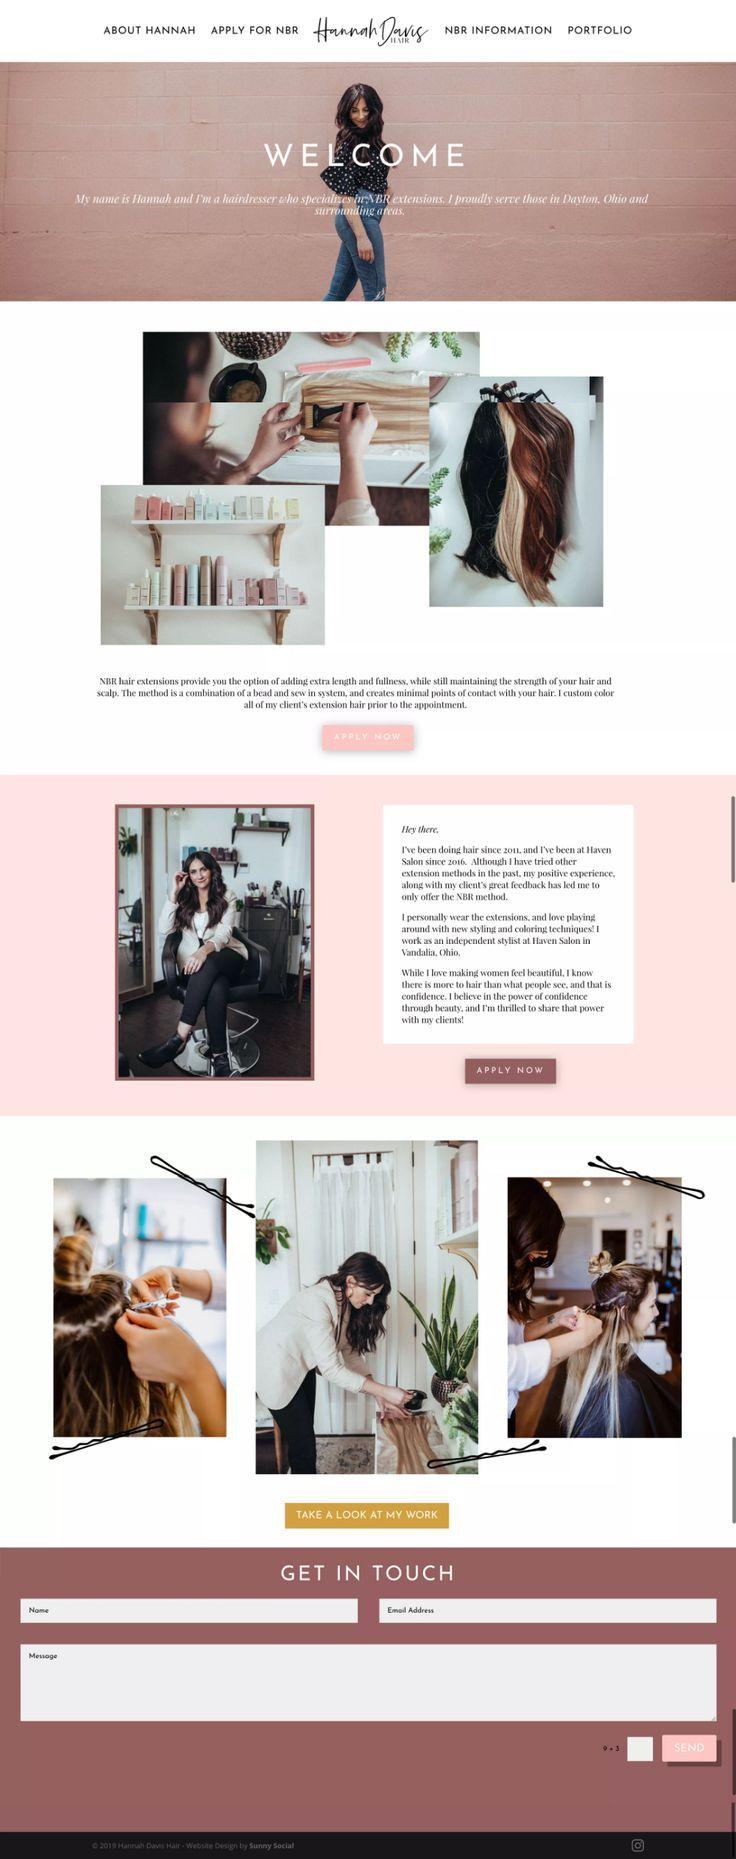 Sunny Social Website Design For Hannah Davis Web Design Web Design Inspiration Web Design Layout Portfolio Web Design Website Design Web Design Inspiration